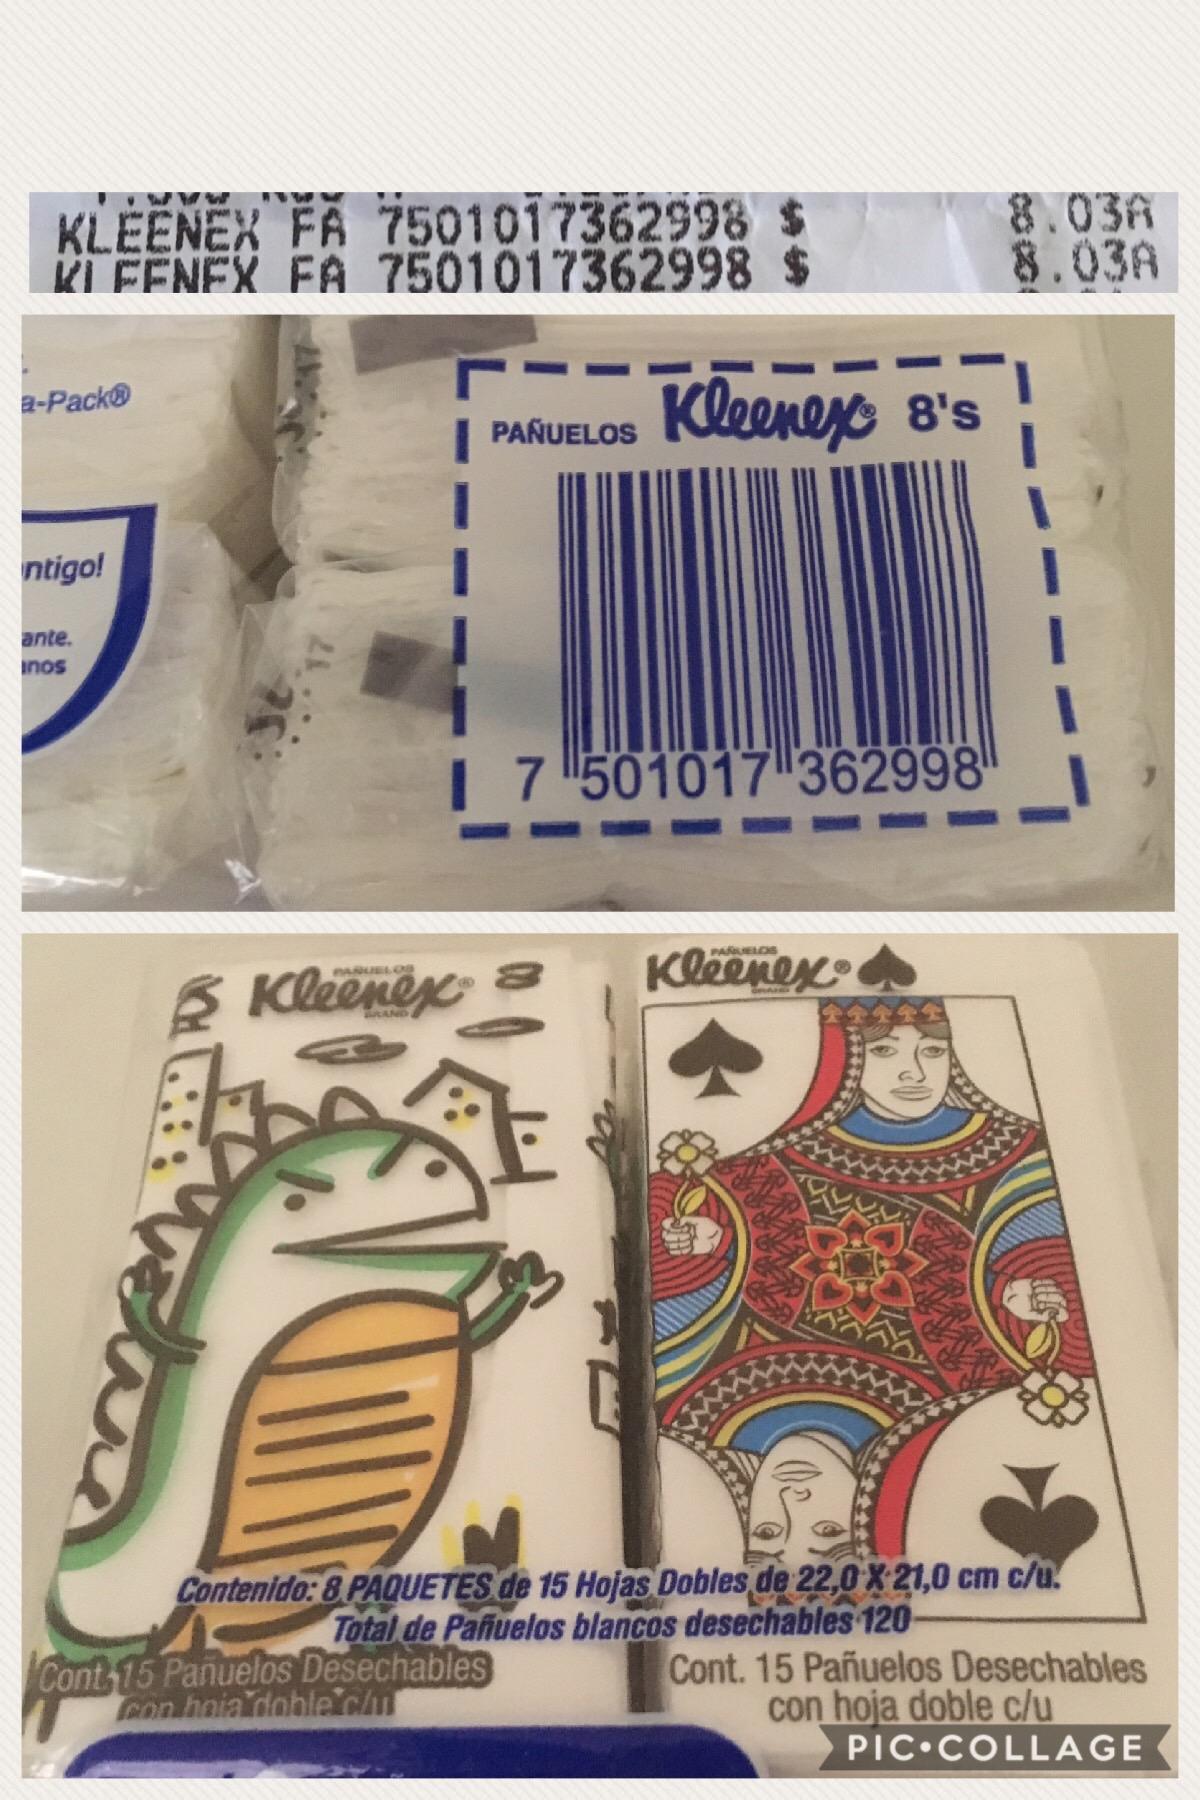 Walmart Metepec EDOMEX: paq. 8 pañuelos kleenex de bolsillo a $8.03